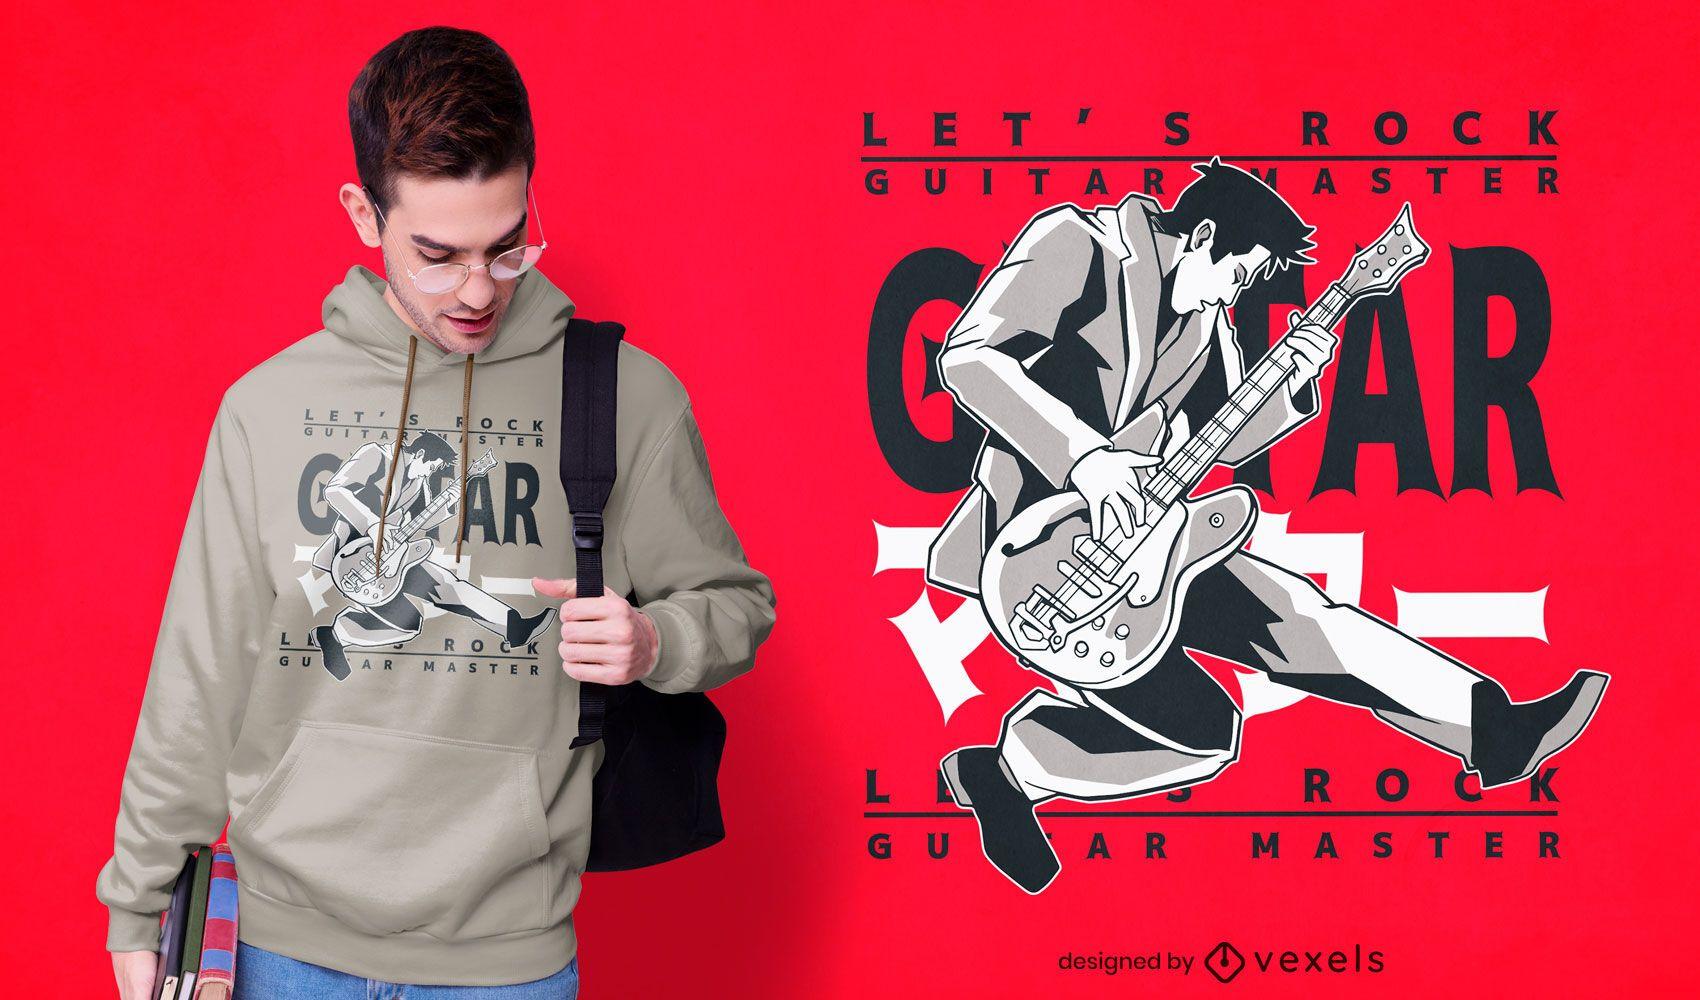 Guitar master Japanese t-shirt design